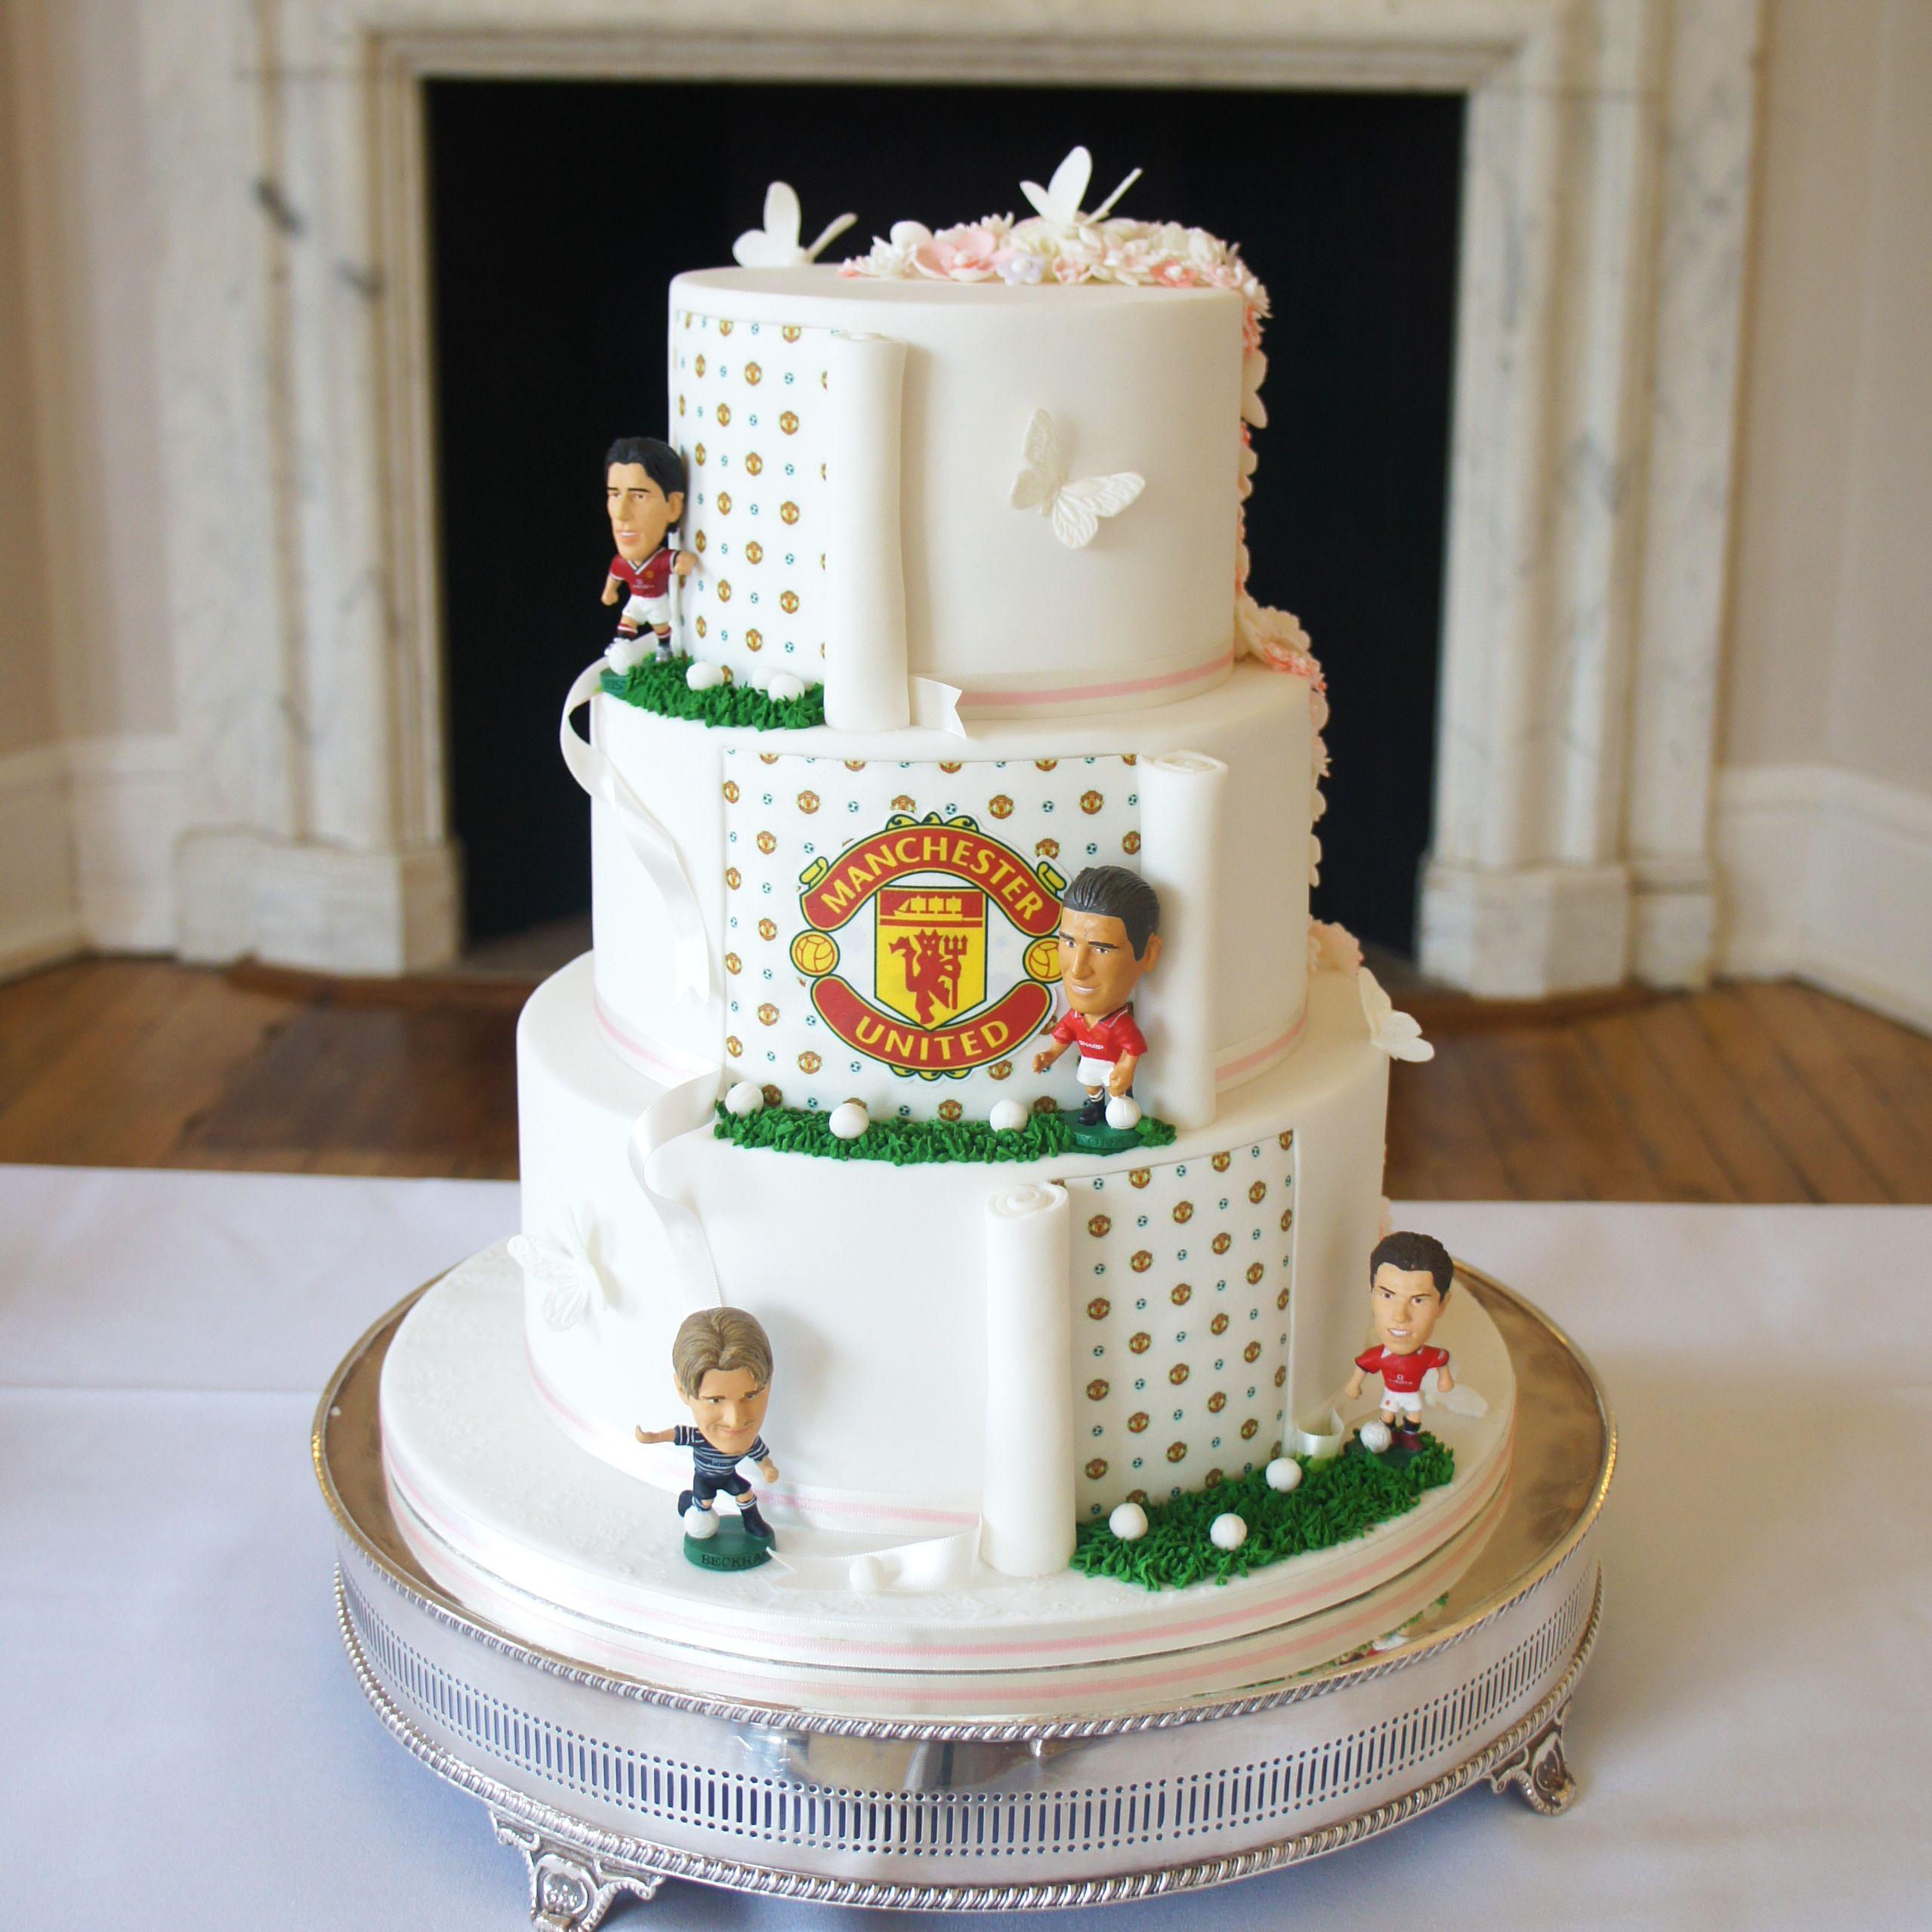 Soccer Themed Wedding Ideas: Football Themed Wedding Cake This 3 Tier